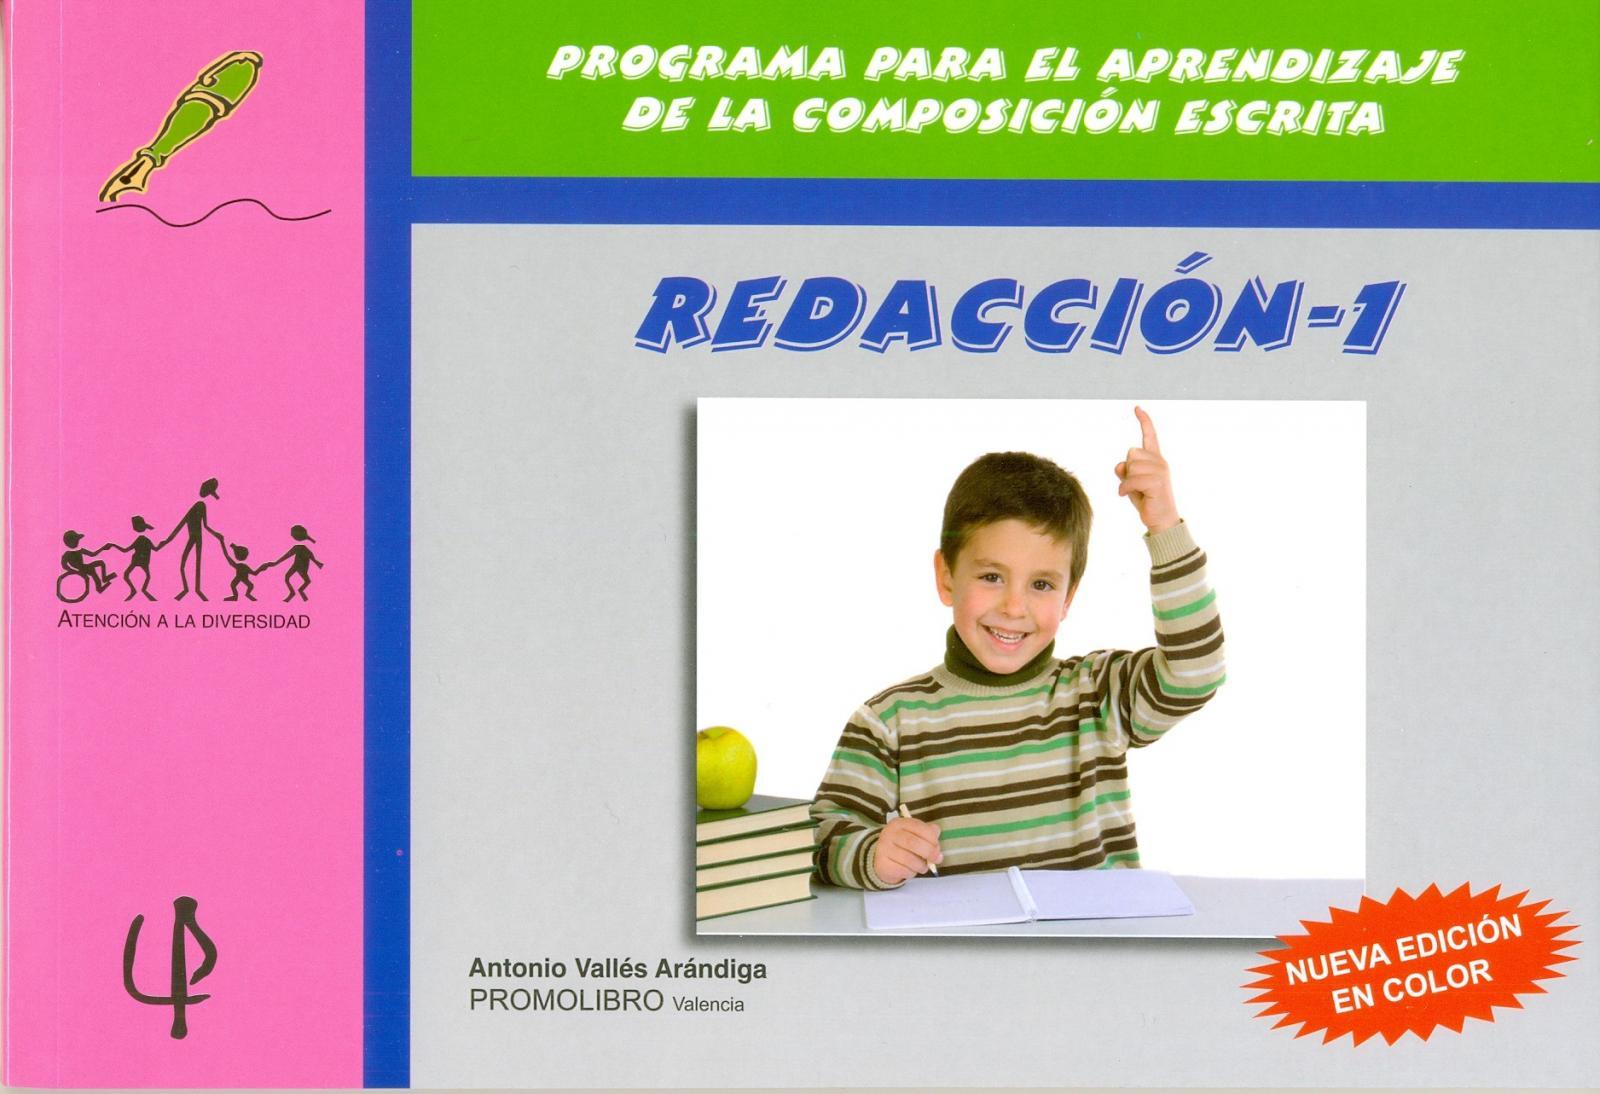 044.- REDACCIÓN-1